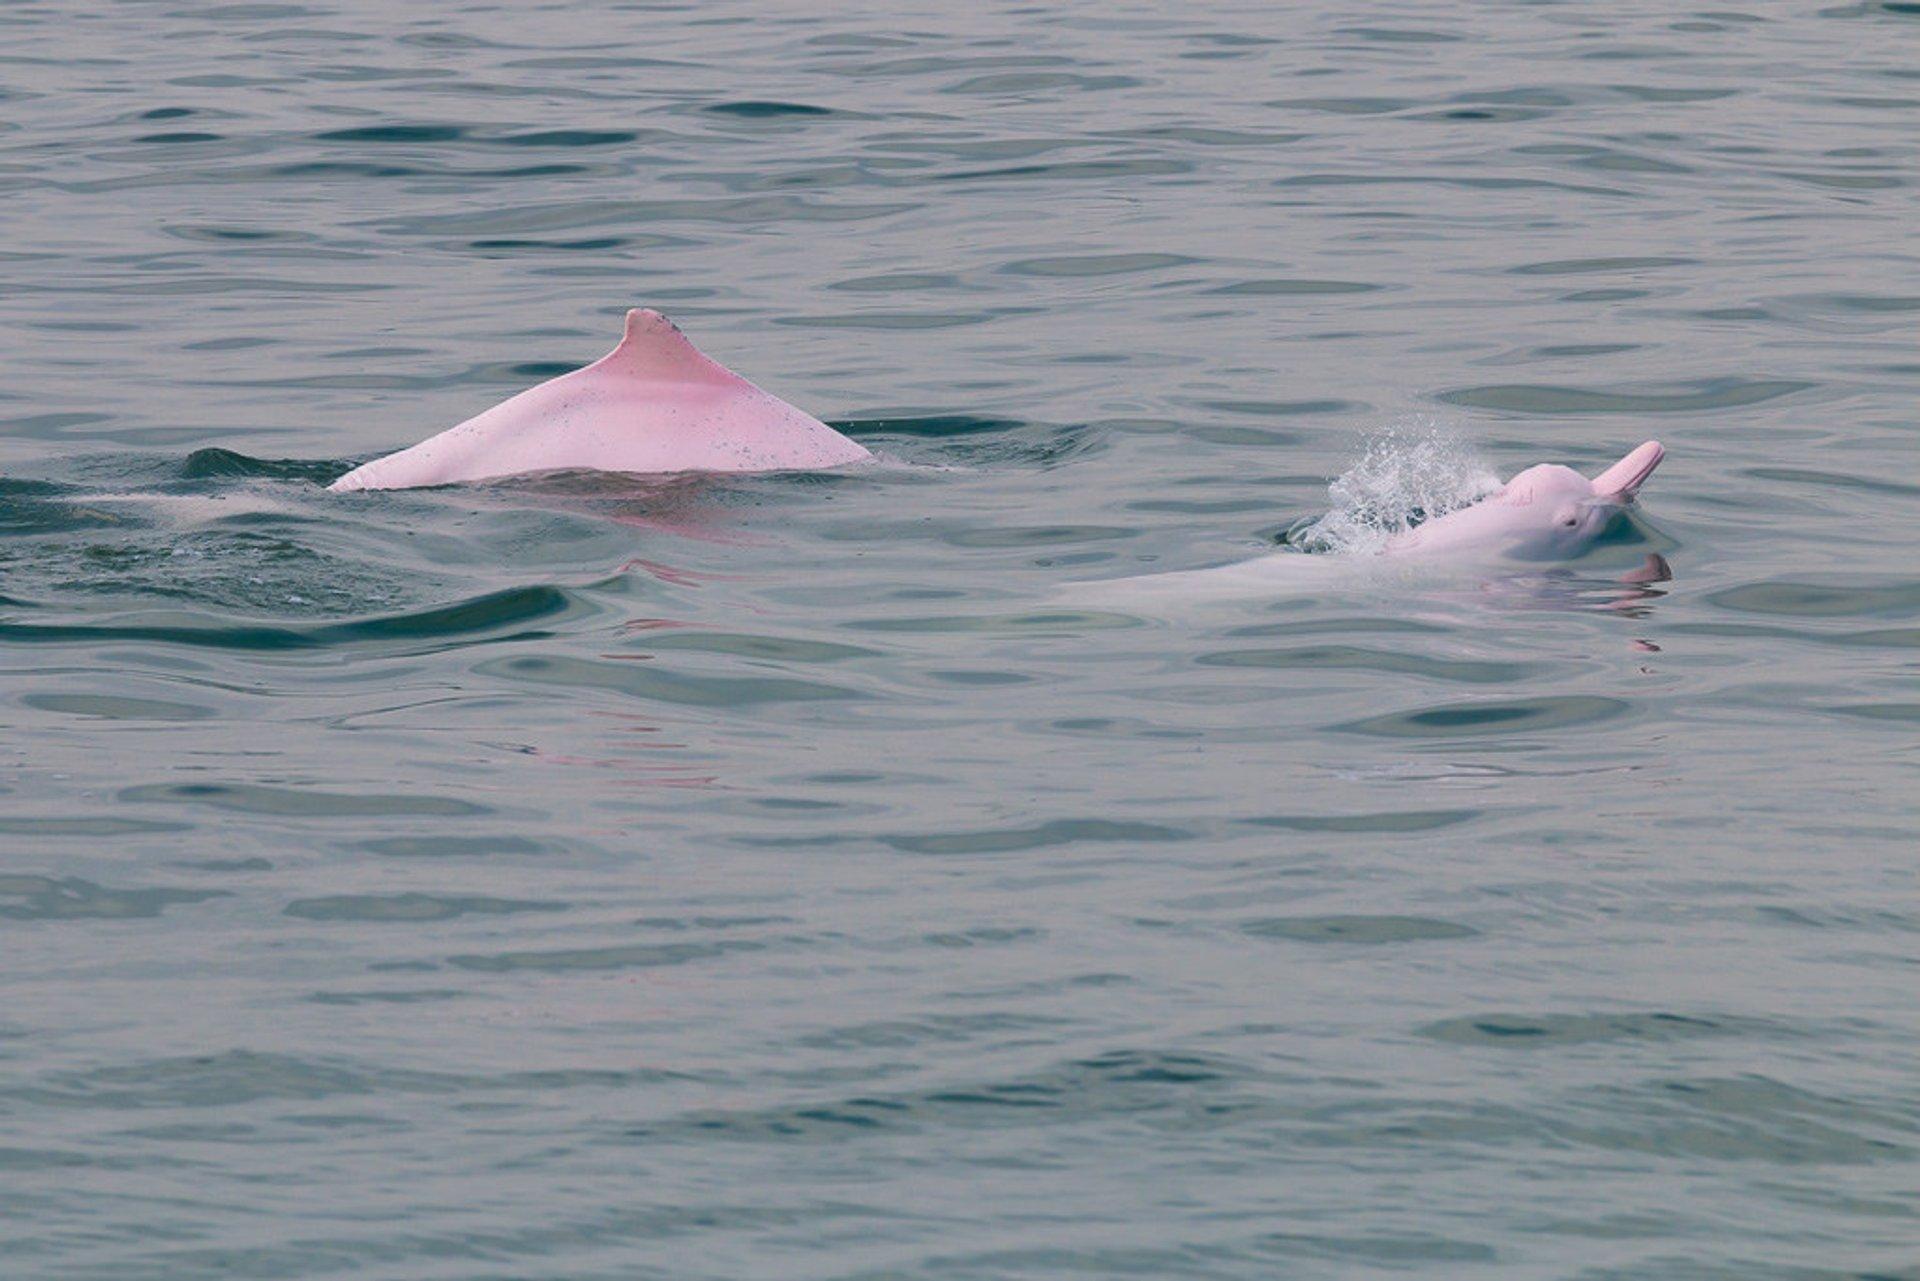 Pink Dolphin Watching in Hong Kong - Best Season